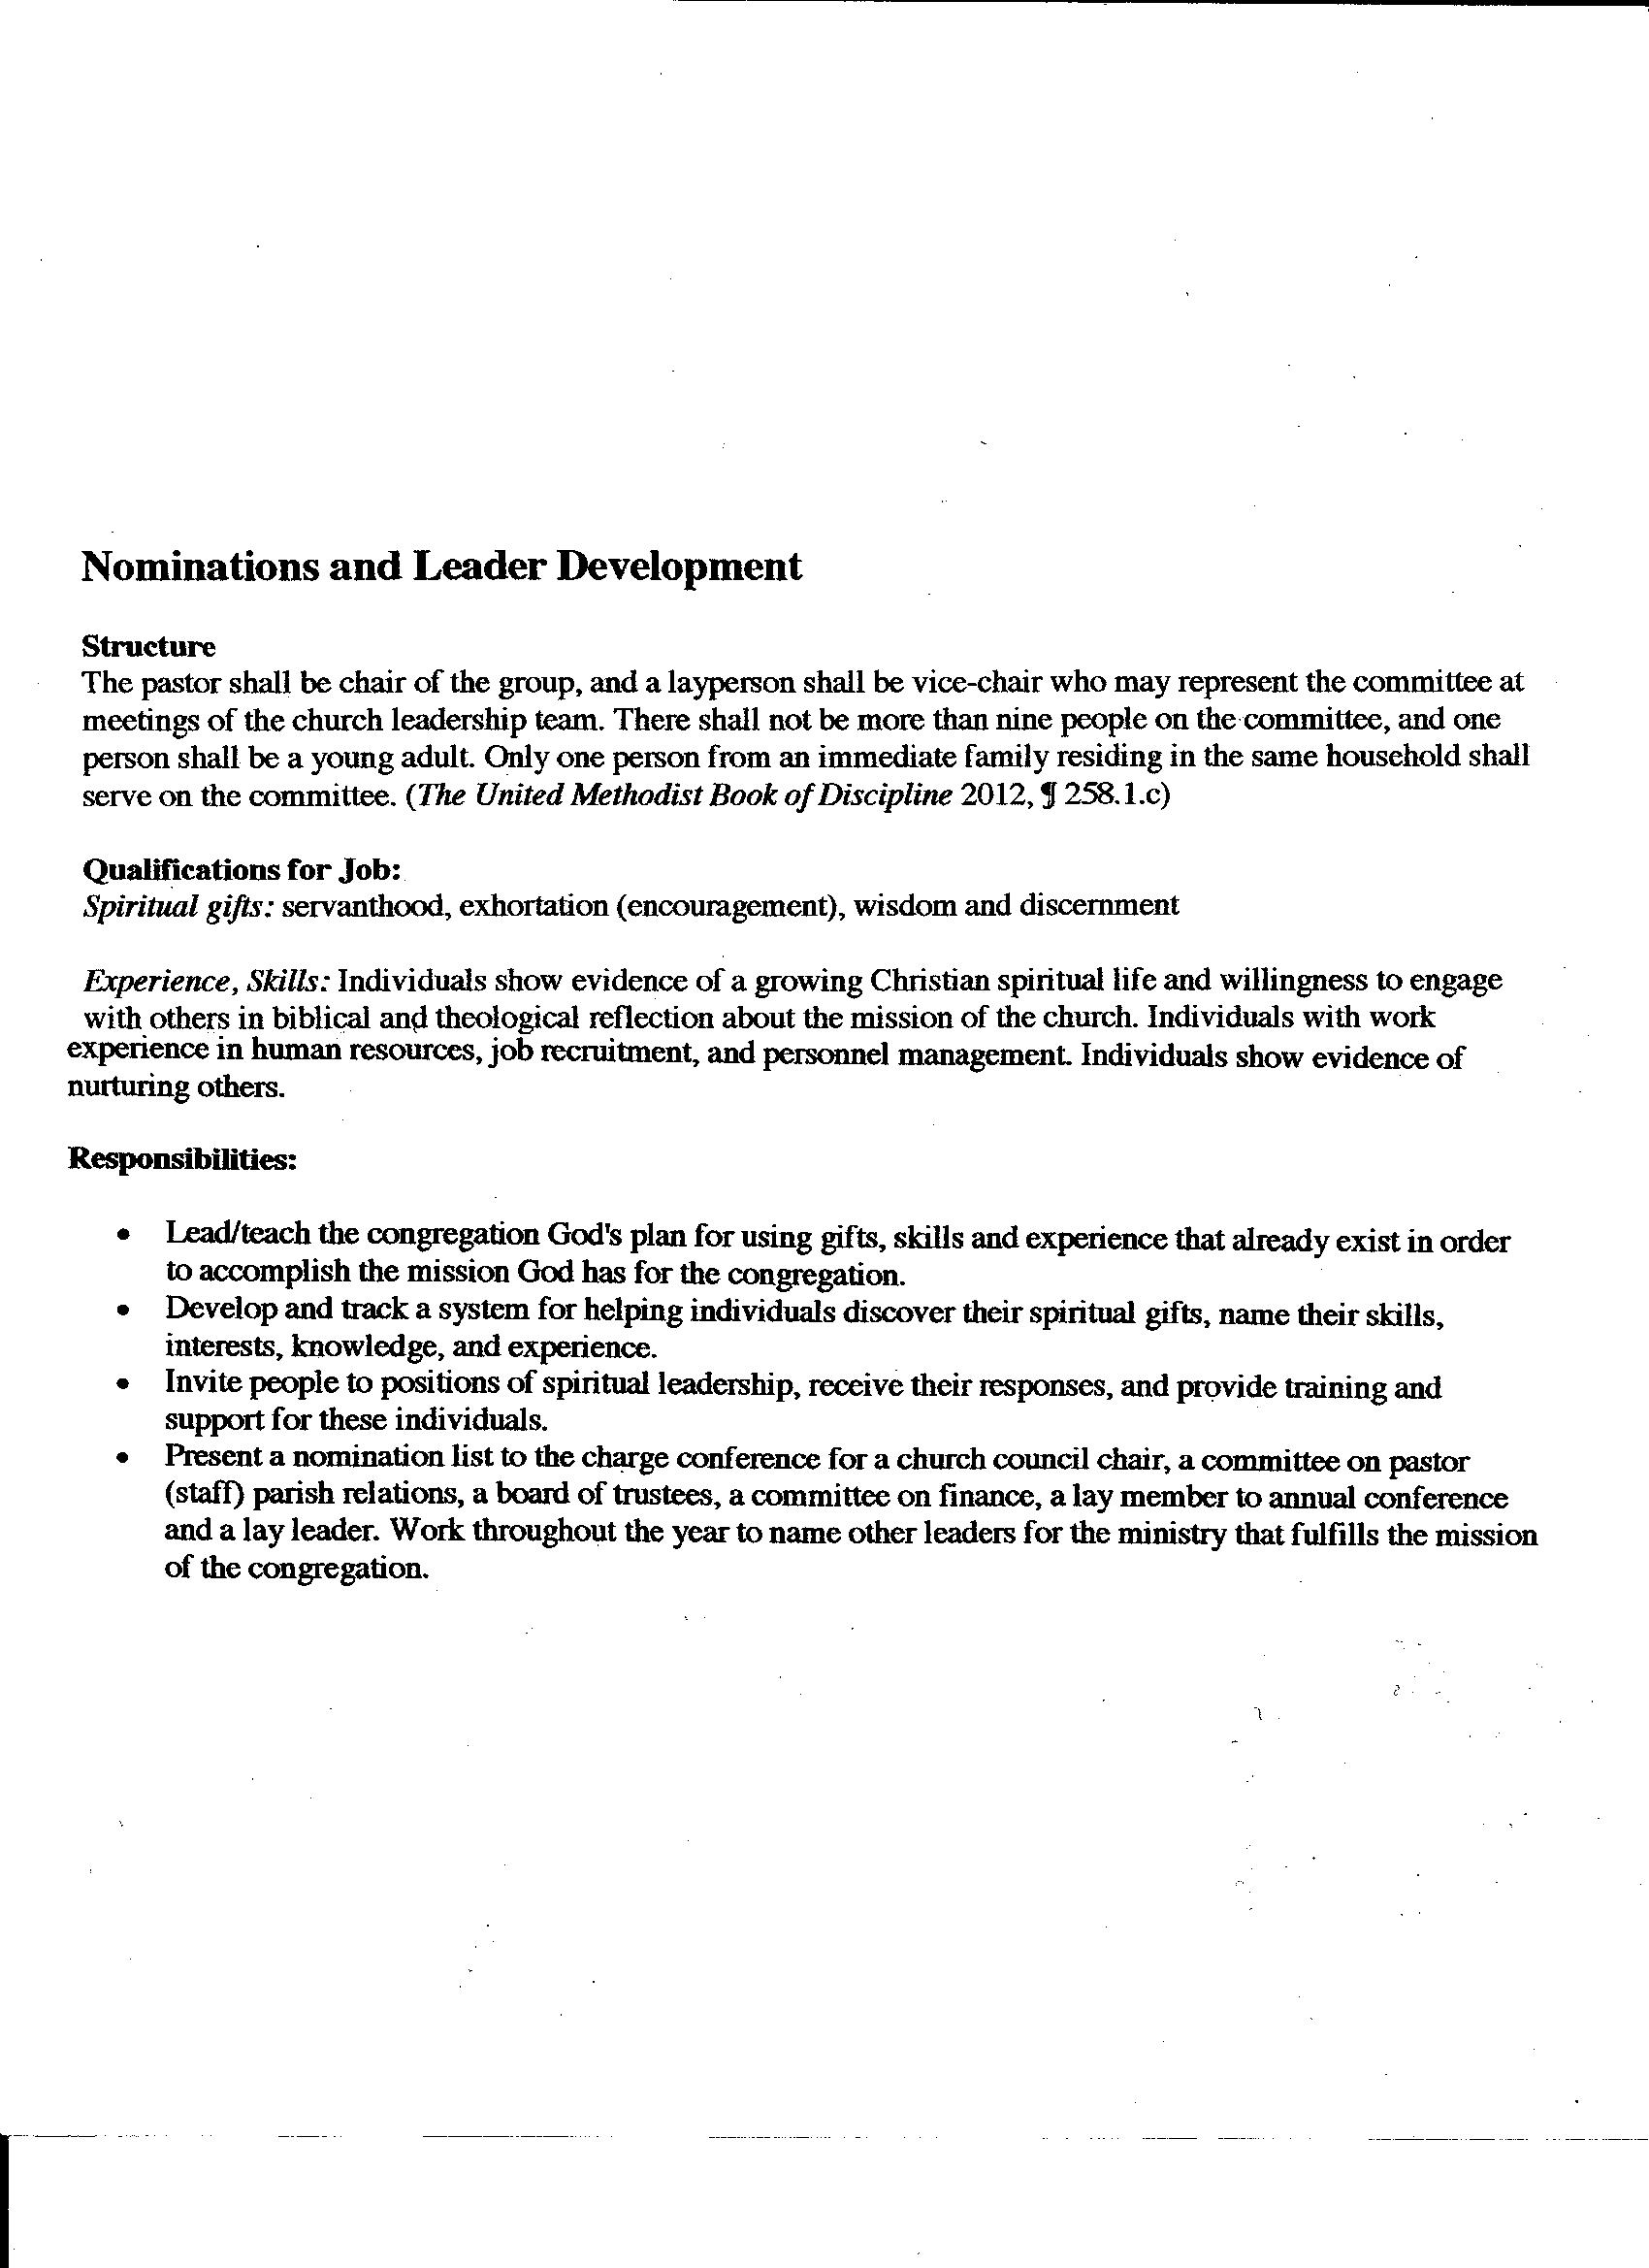 Nominations & Leader Development